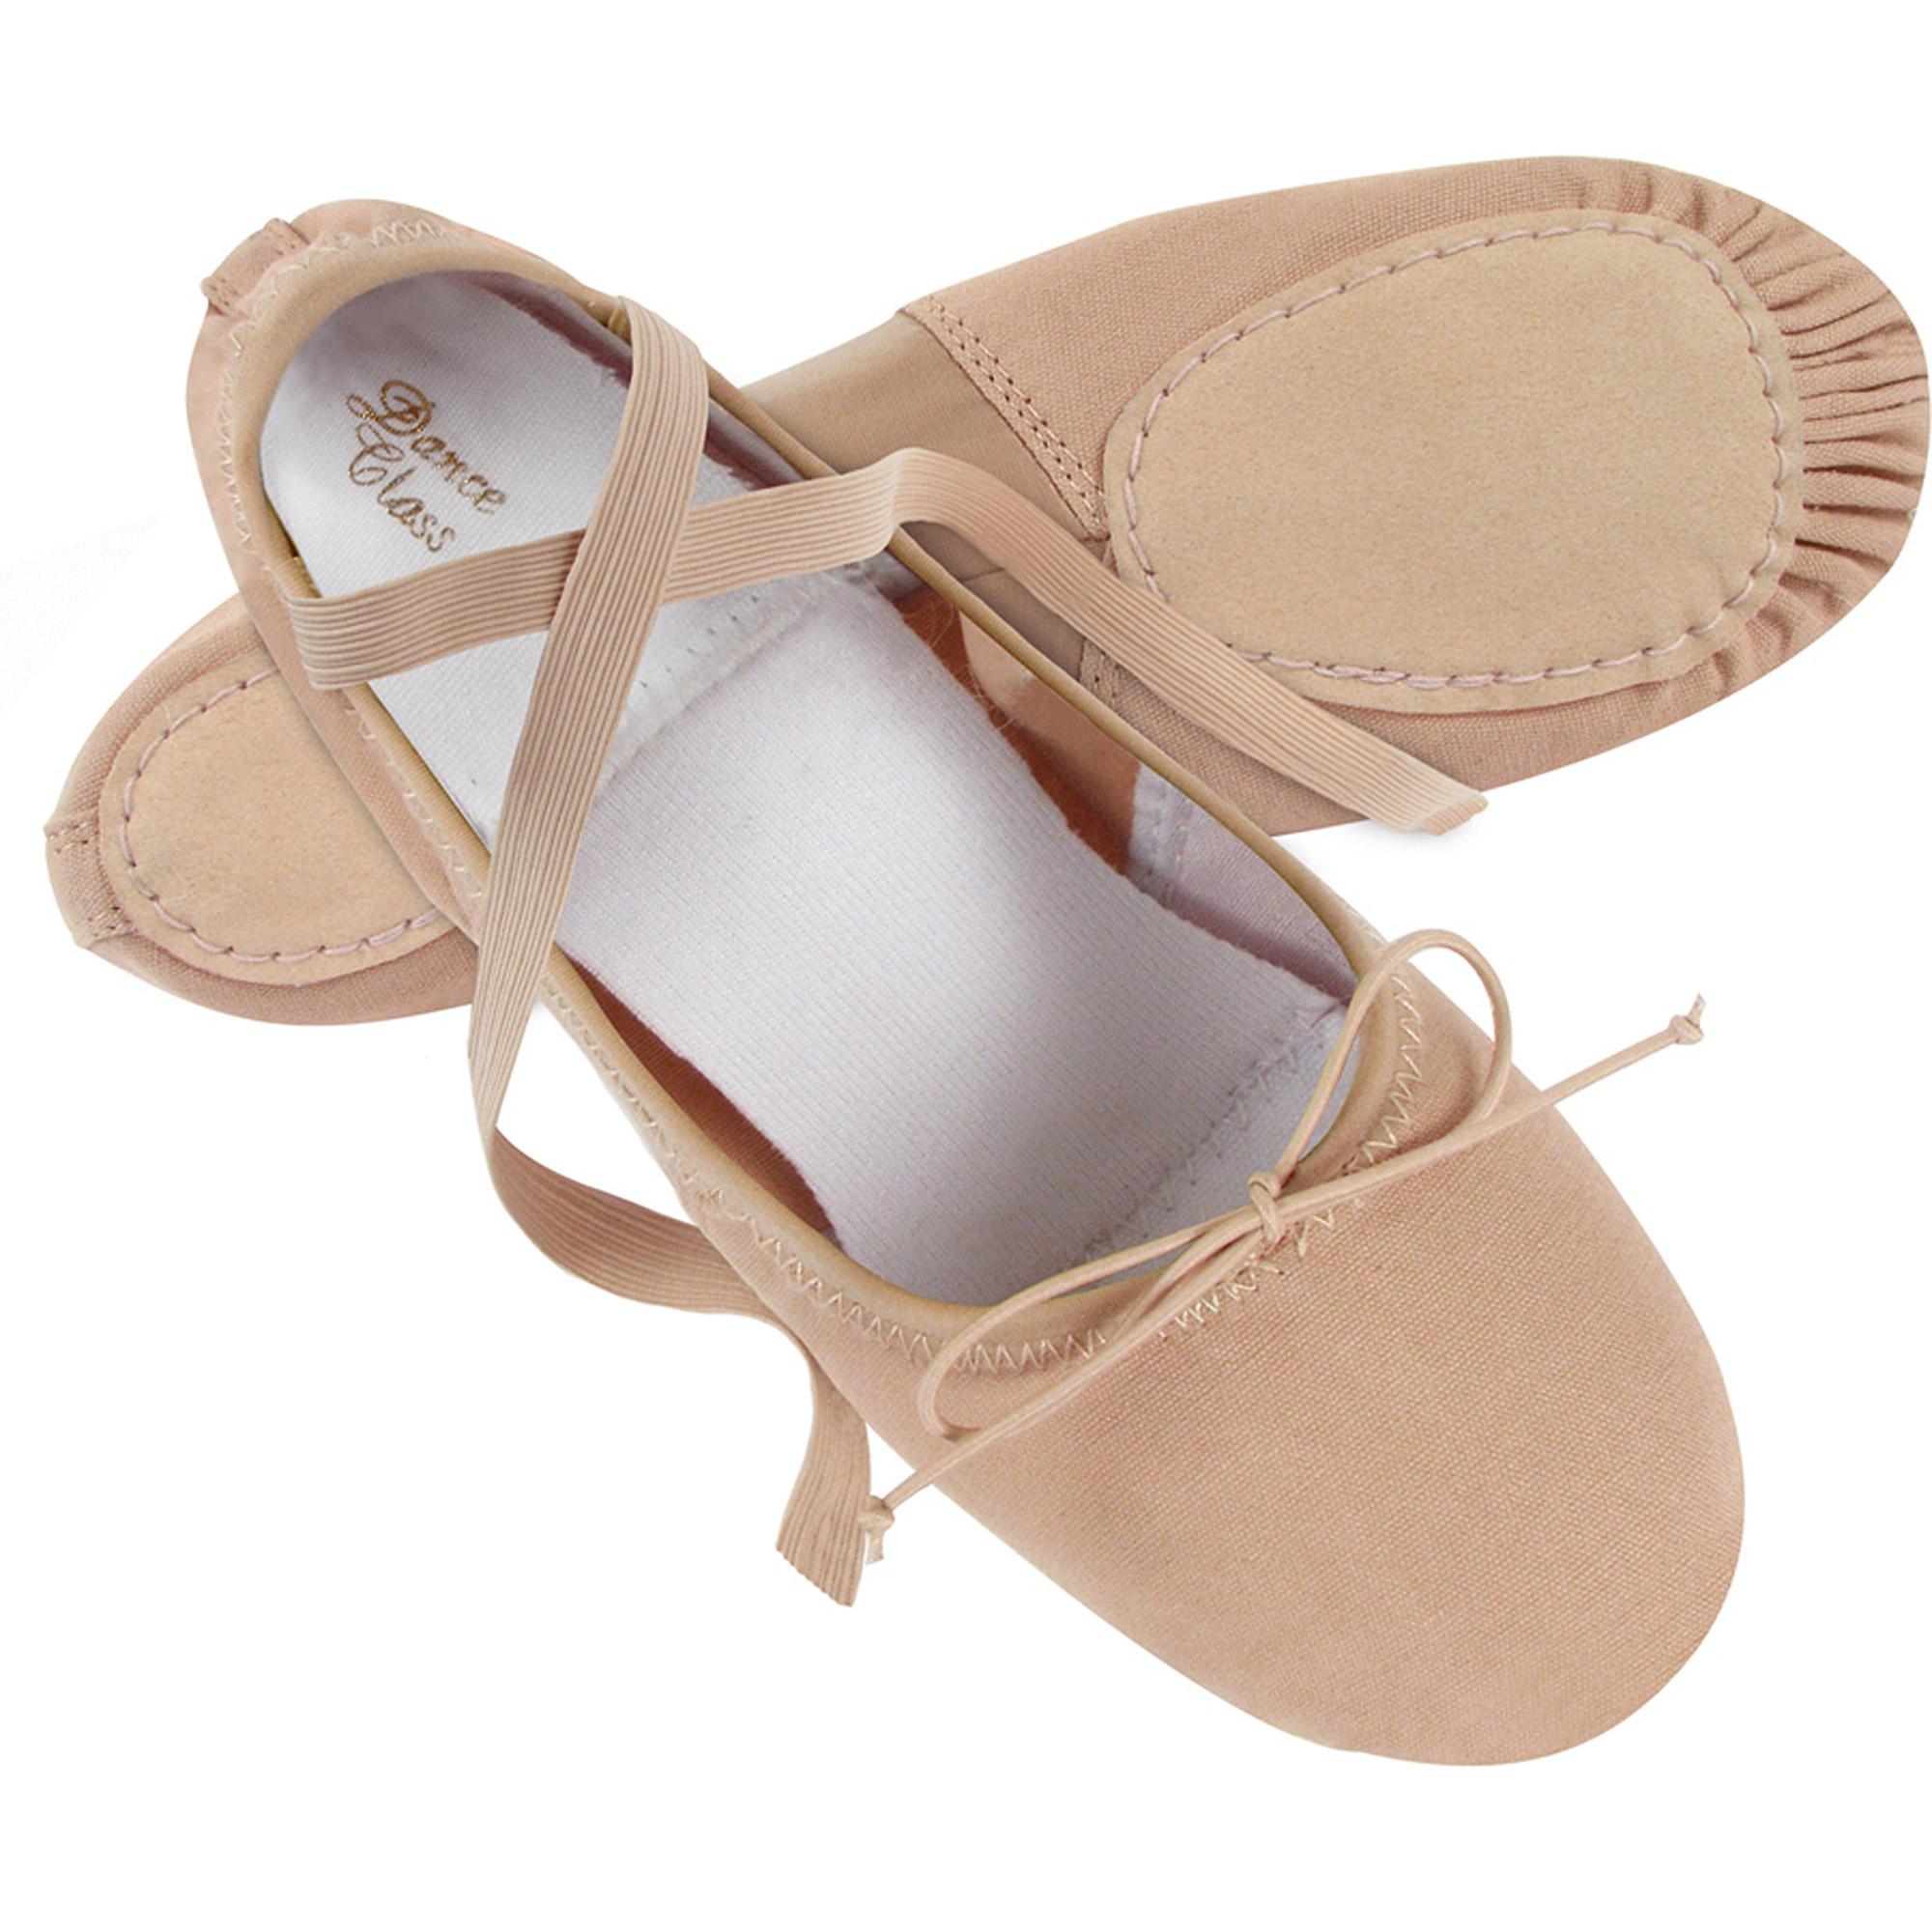 Dance Class by Trimfoot Women's Canvas Ballet Shoe